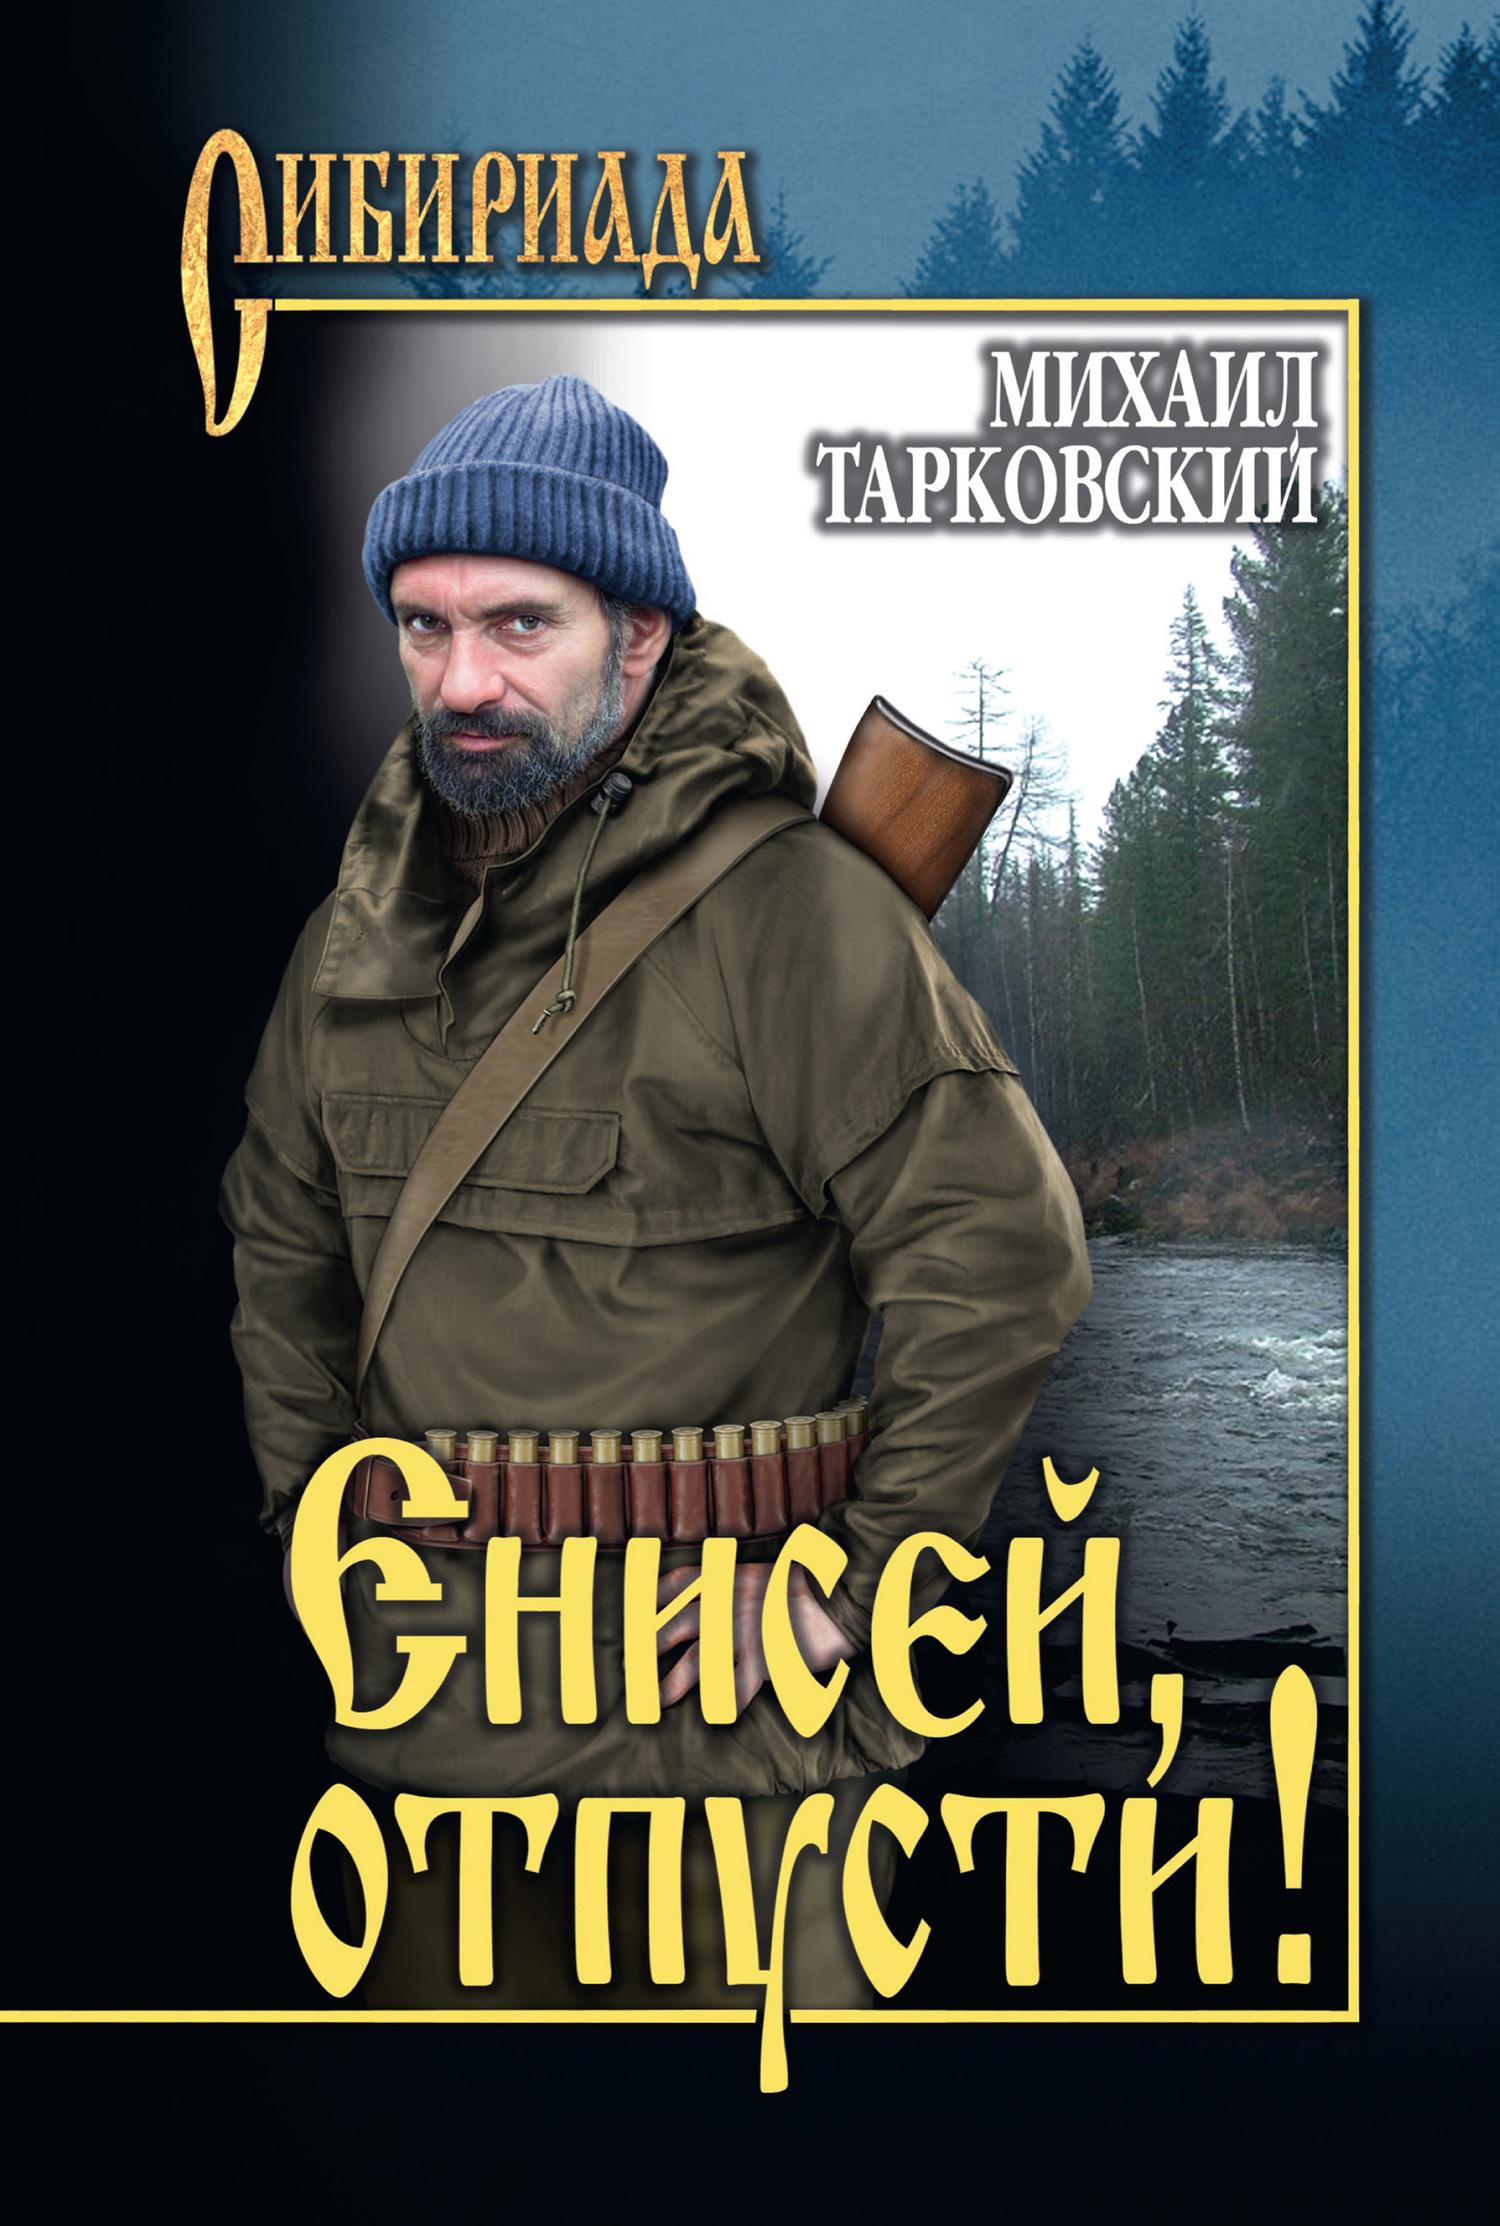 Борис Акунин  Азазель скачать FB2 TXT EPUB MOBI